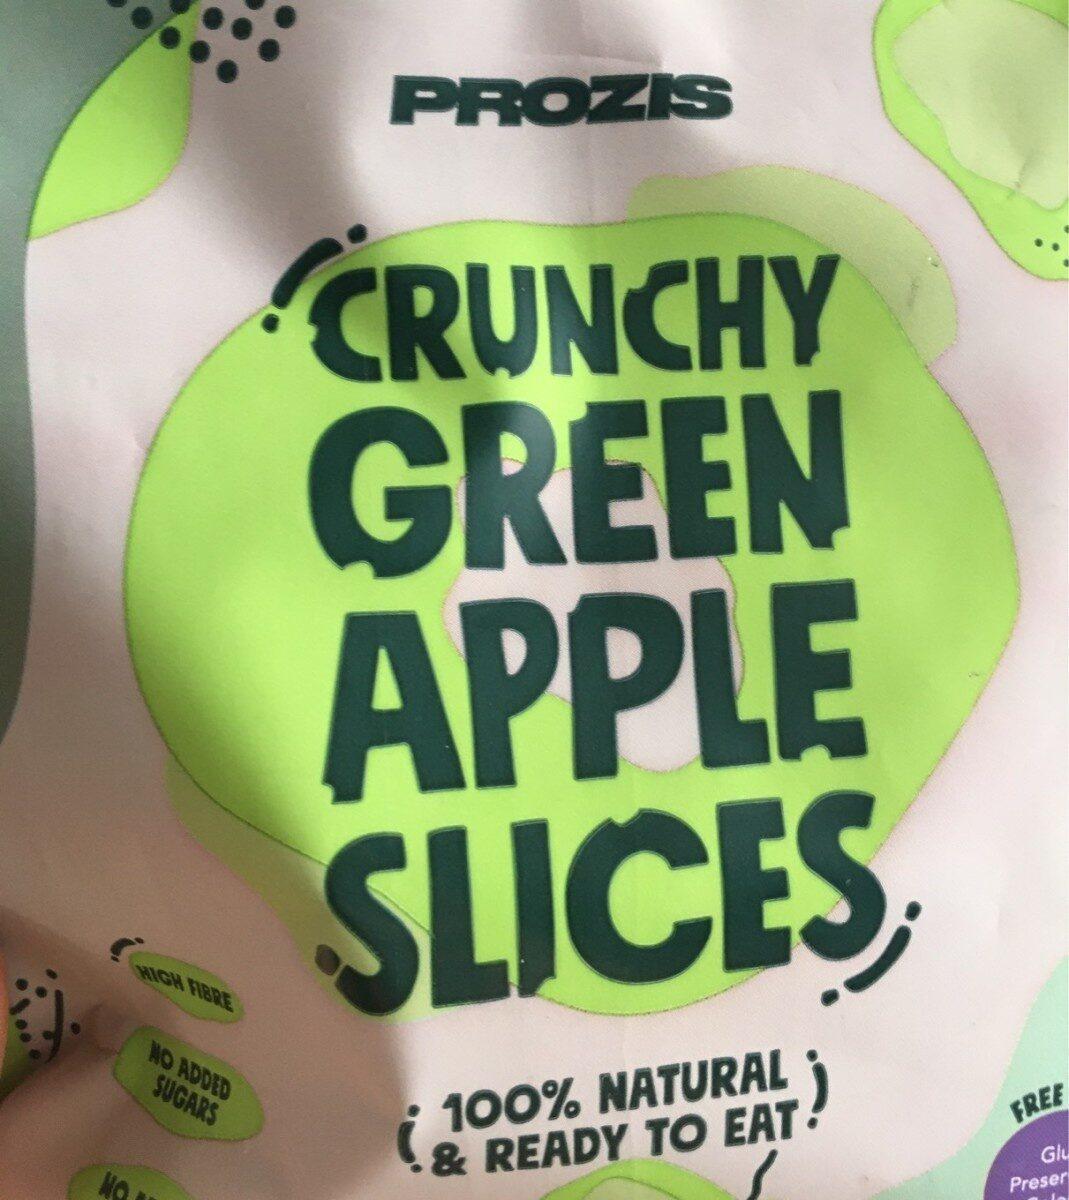 Crunchy green apple slices - Produit - fr